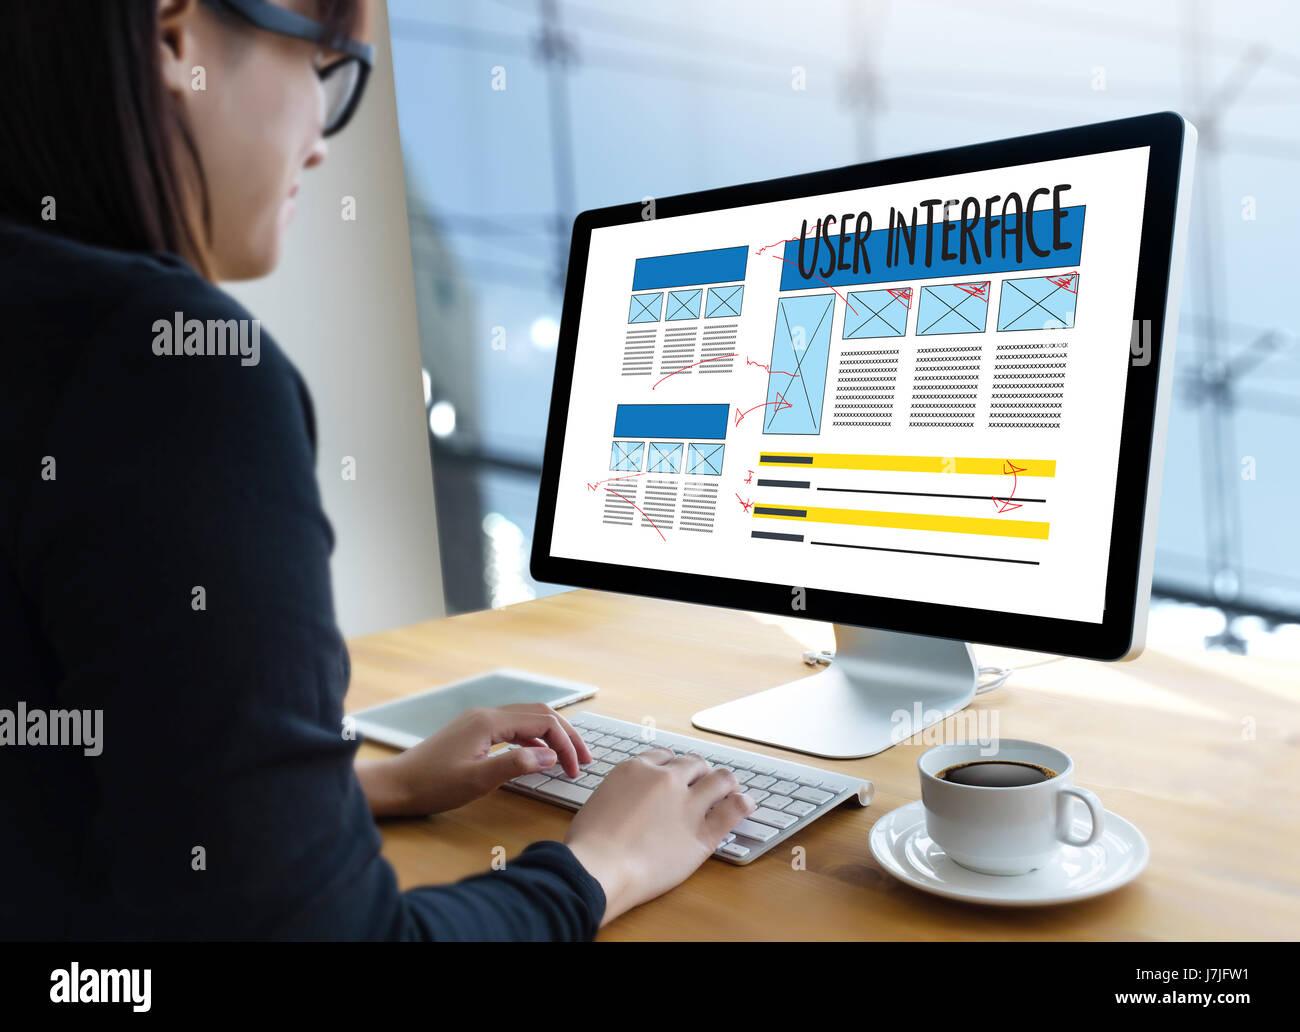 USER INTERFACE Global Address Browser Internet Website Design Stock